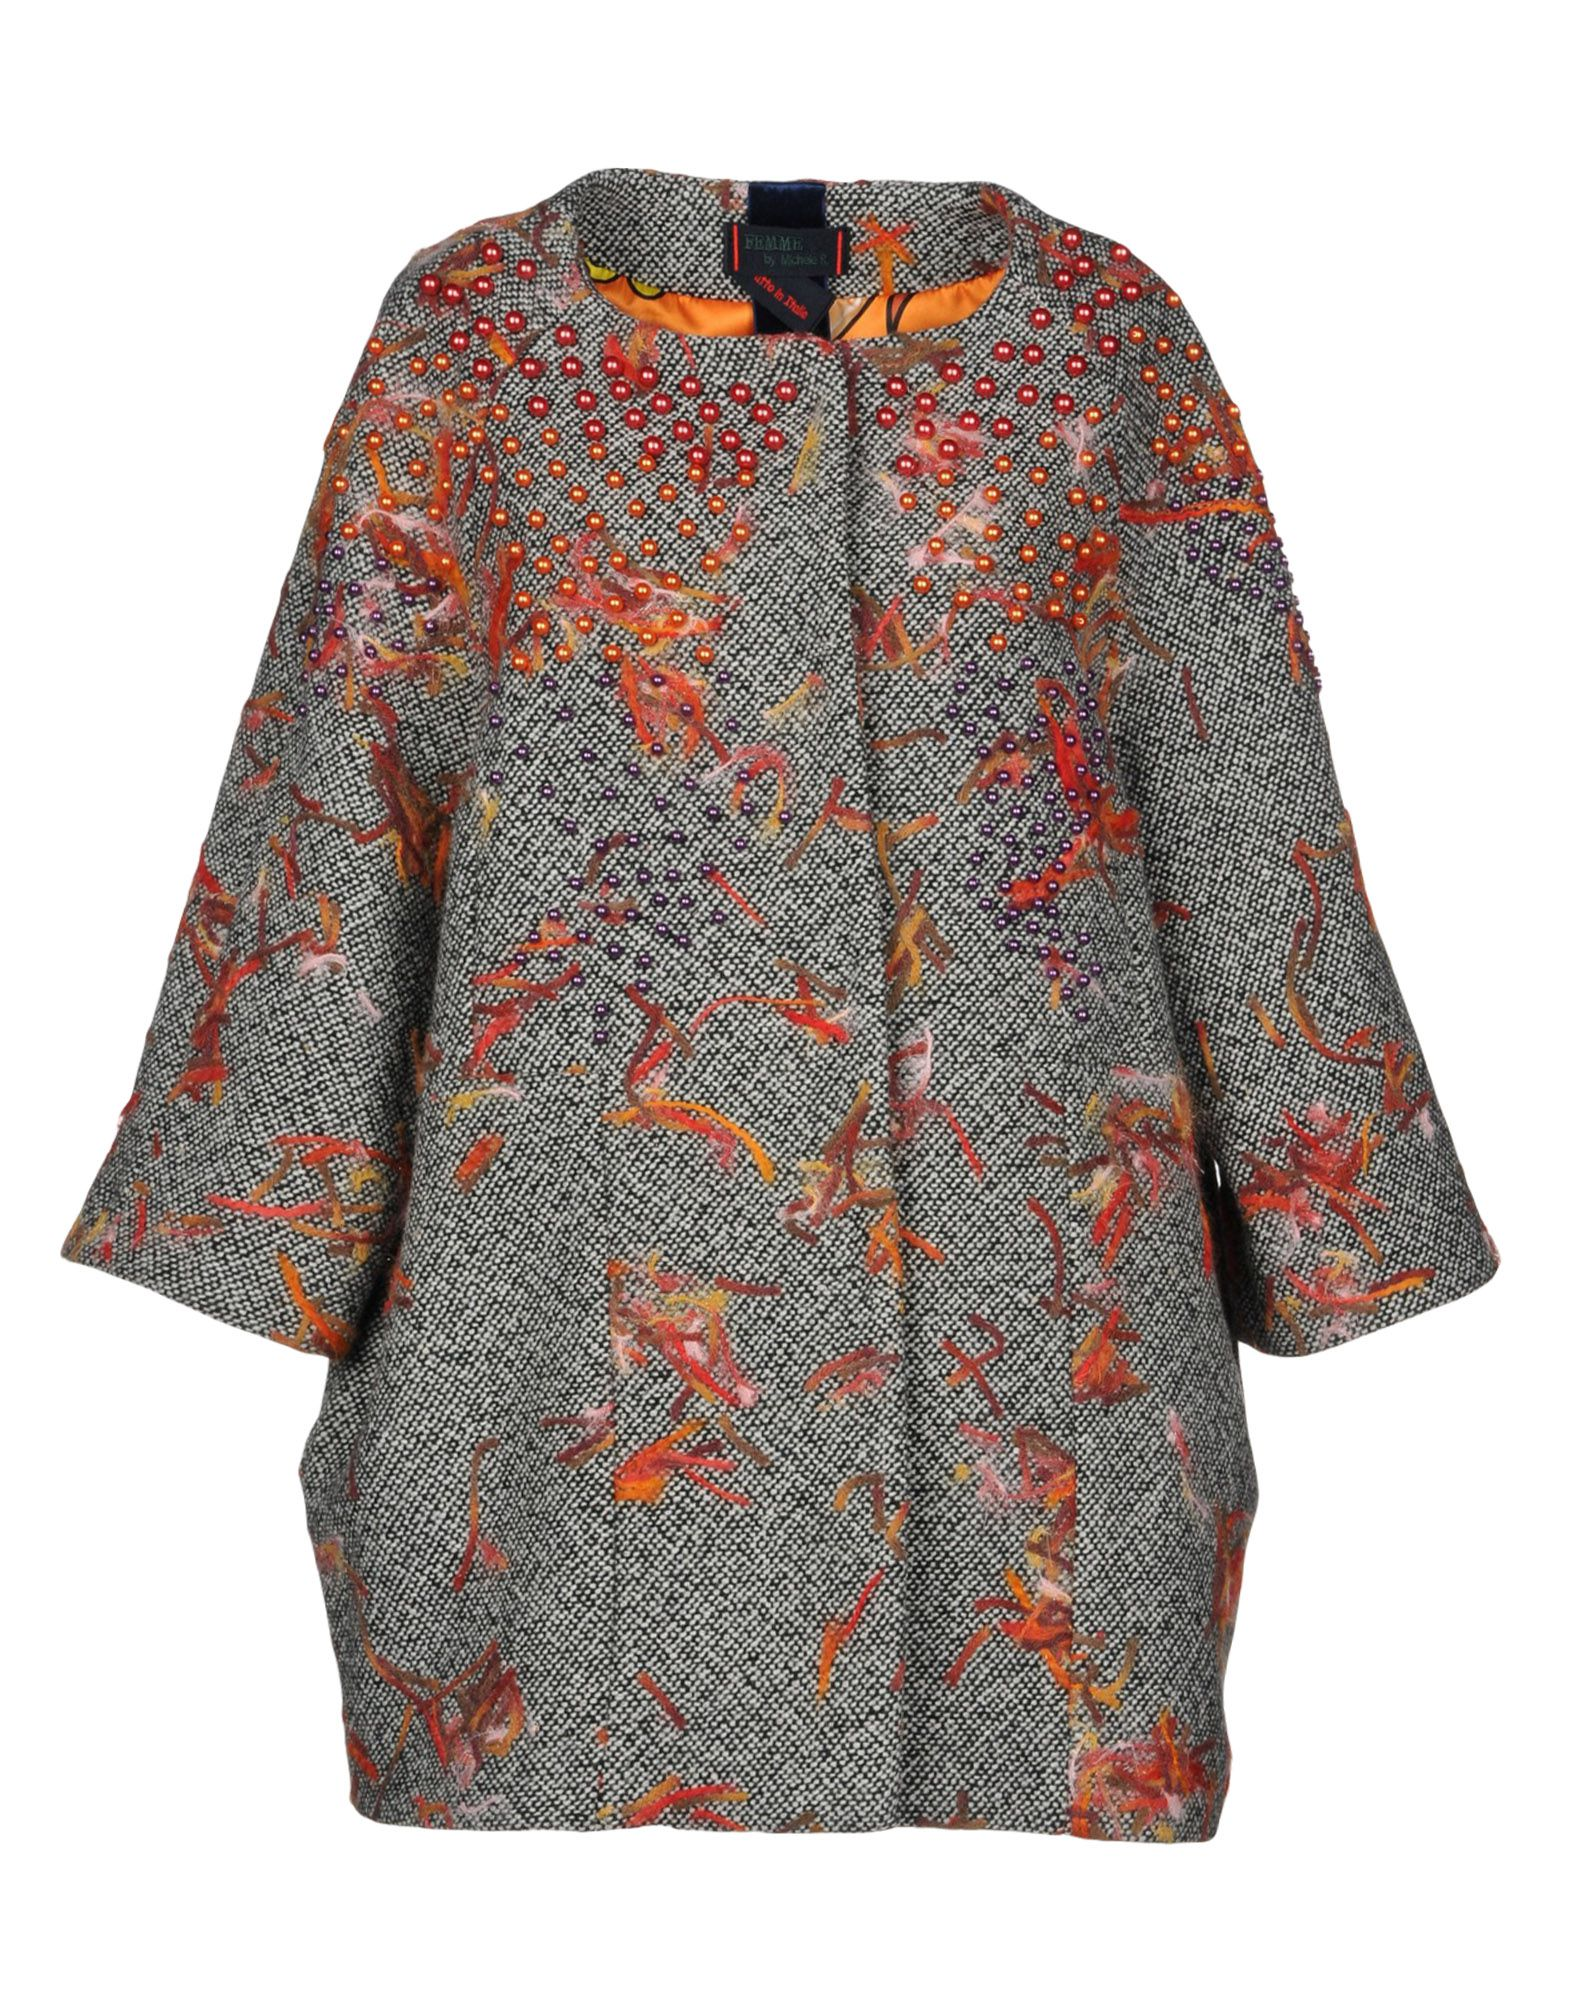 FEMME BY MICHELE ROSSI Coat in Grey